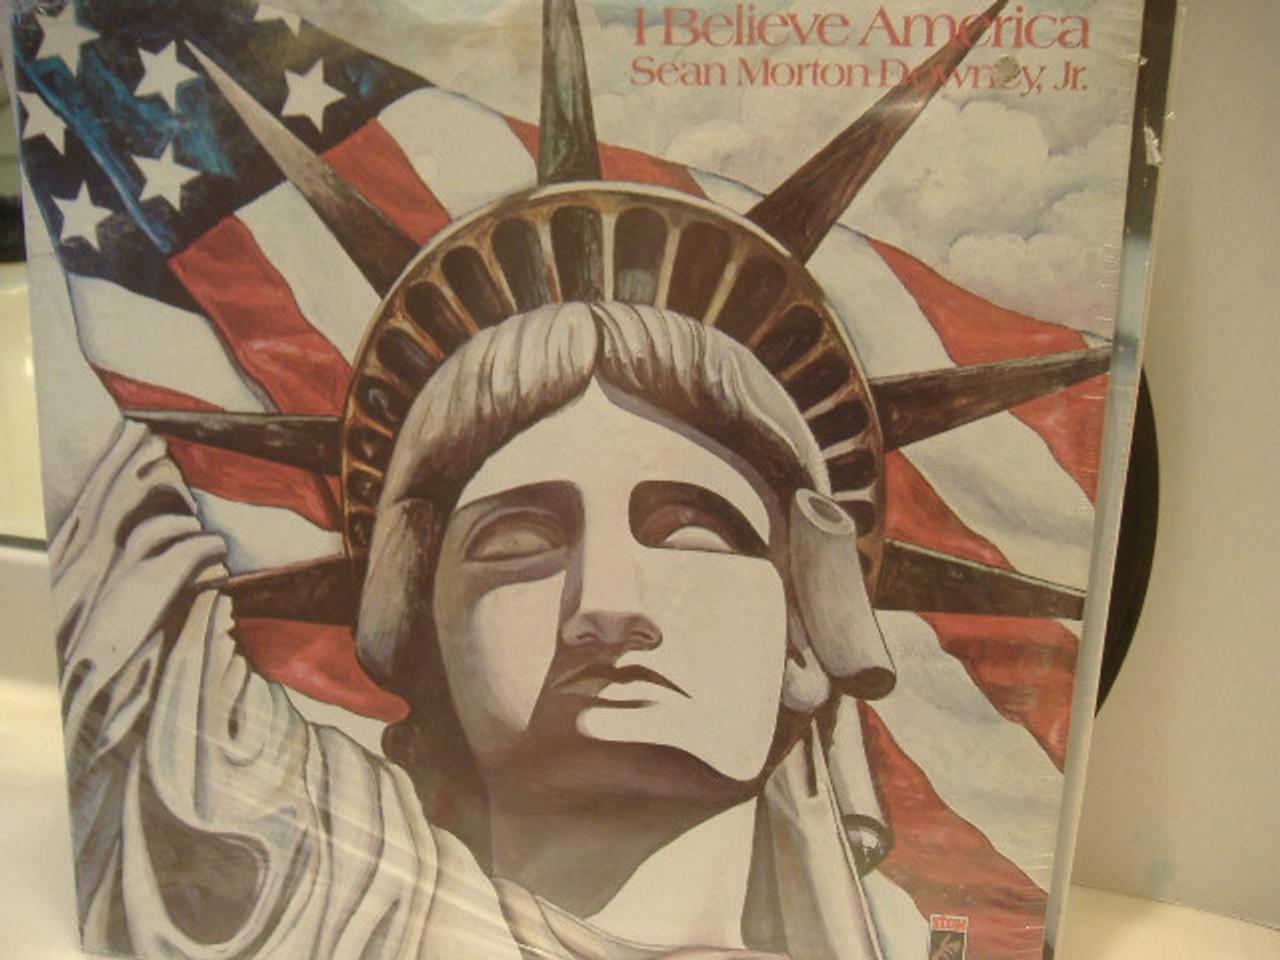 Downey Jr, Sean Morton LP Signed Autograph Sealed I Believe America